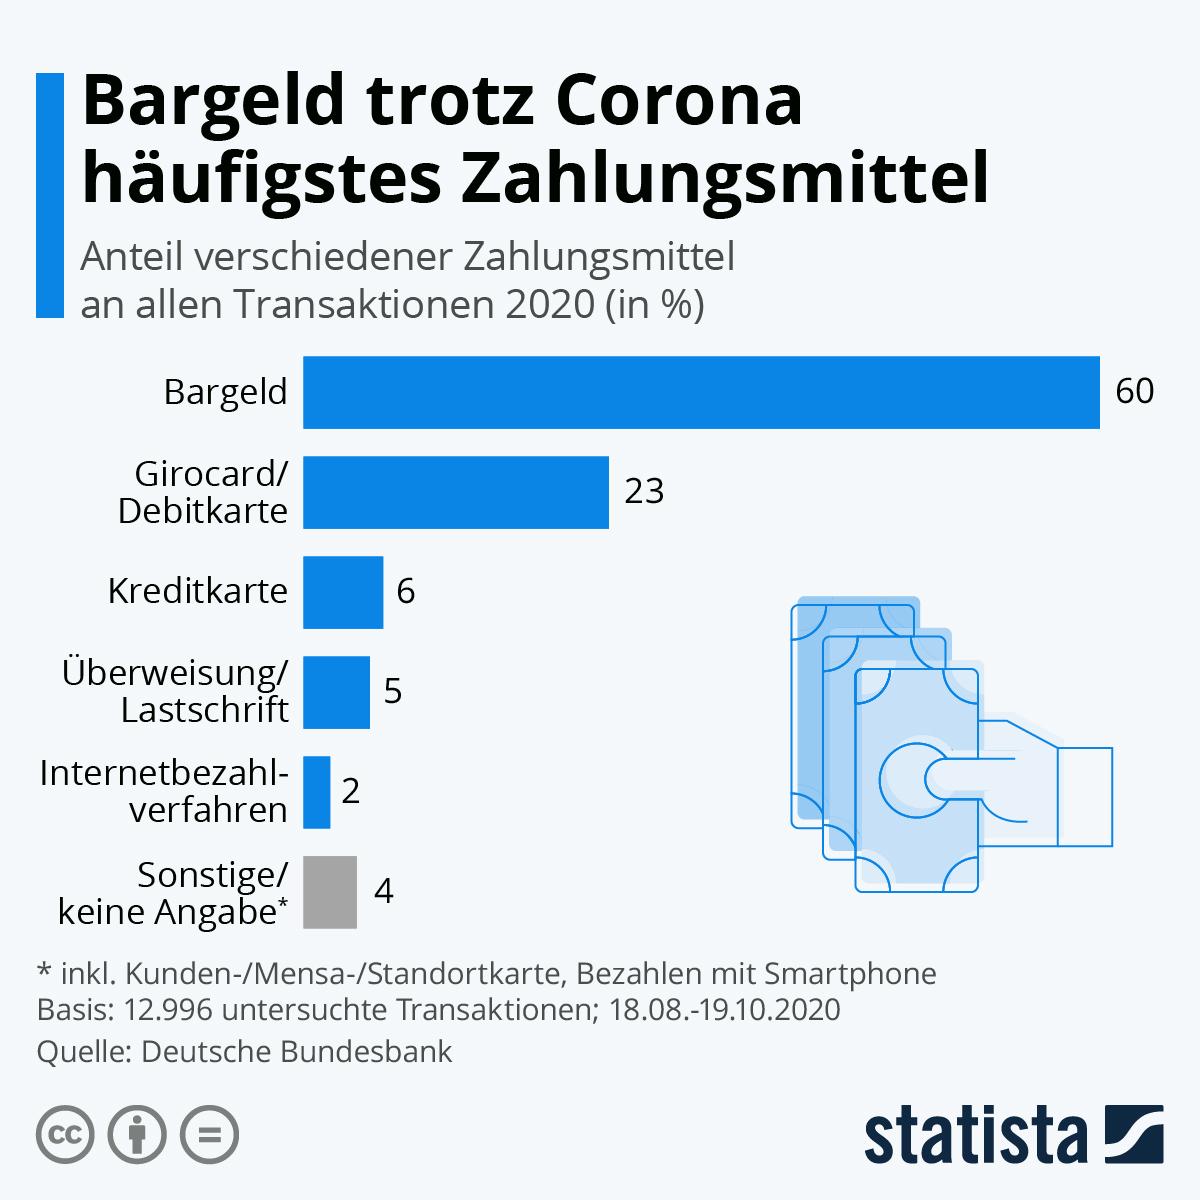 Infografik: Bargeld trotz Corona häufigstes Zahlungsmittel | Statista